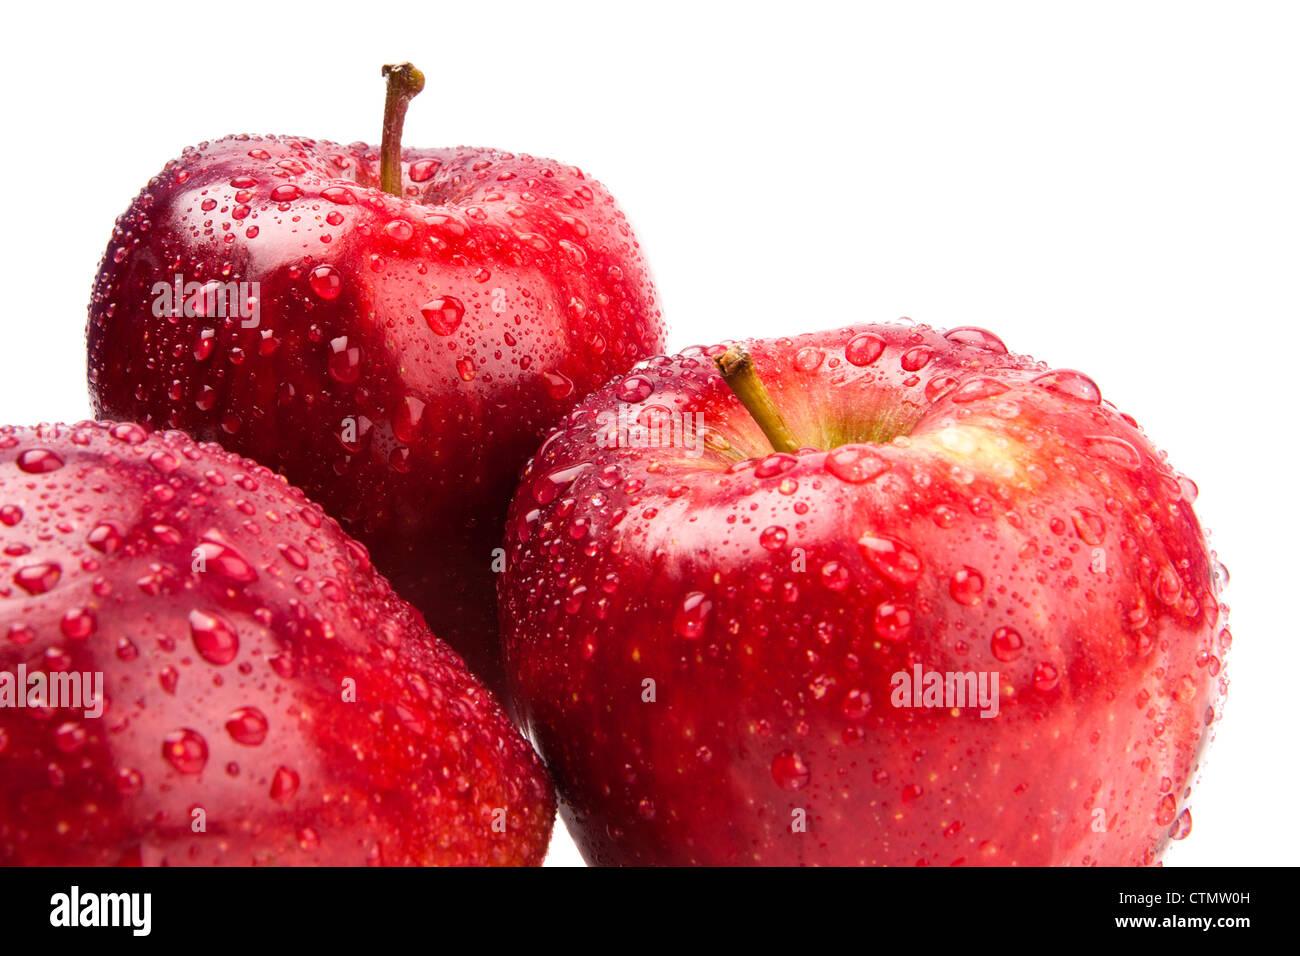 big fresh three apple isolate on white - Stock Image